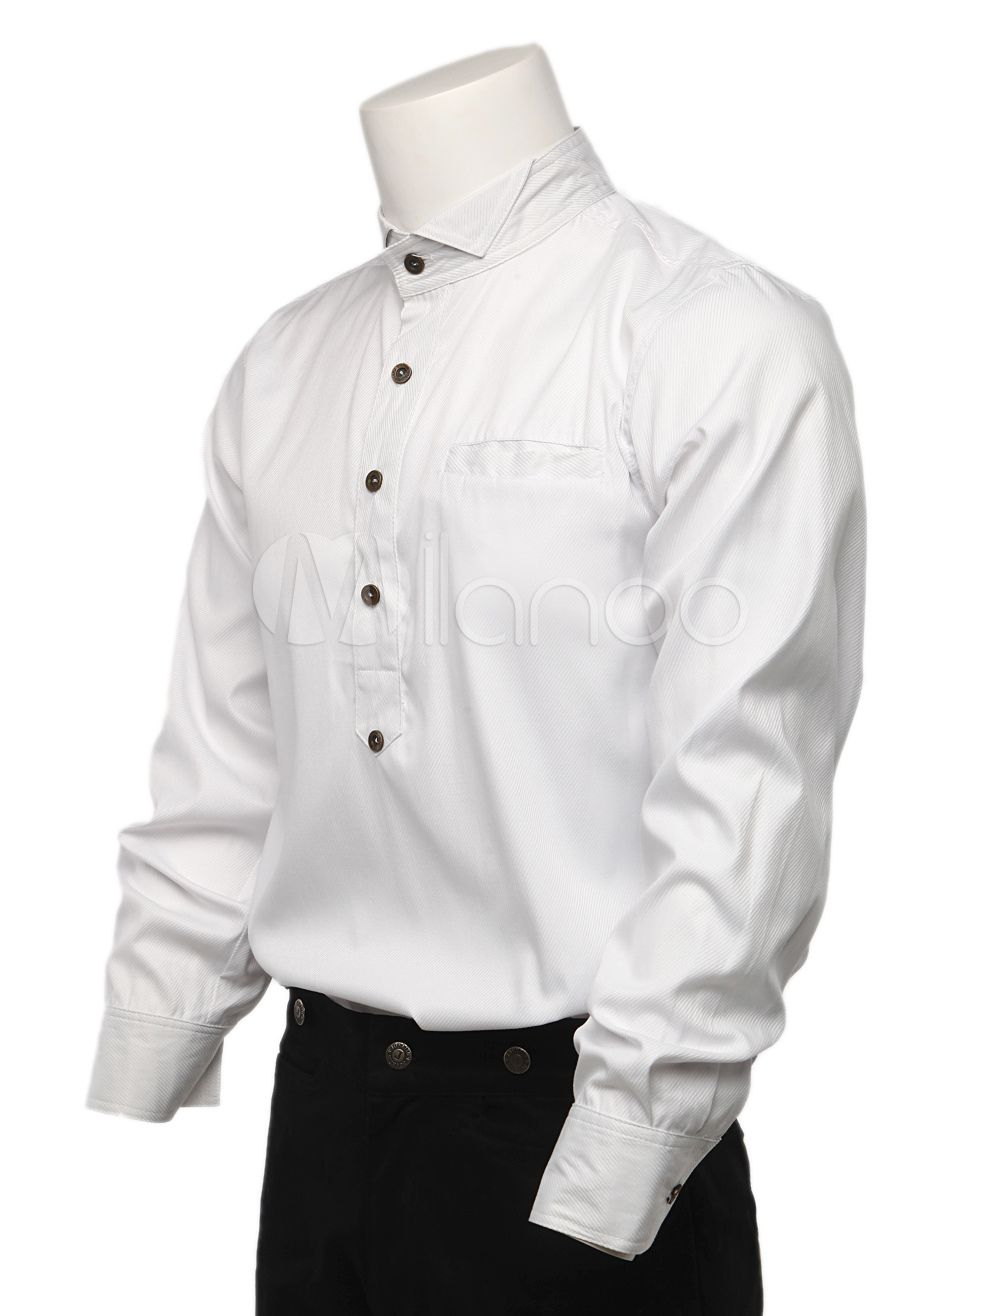 Cozy White Cotton Long Sleeves Steampunk Shirt For Men   Steampunk ...